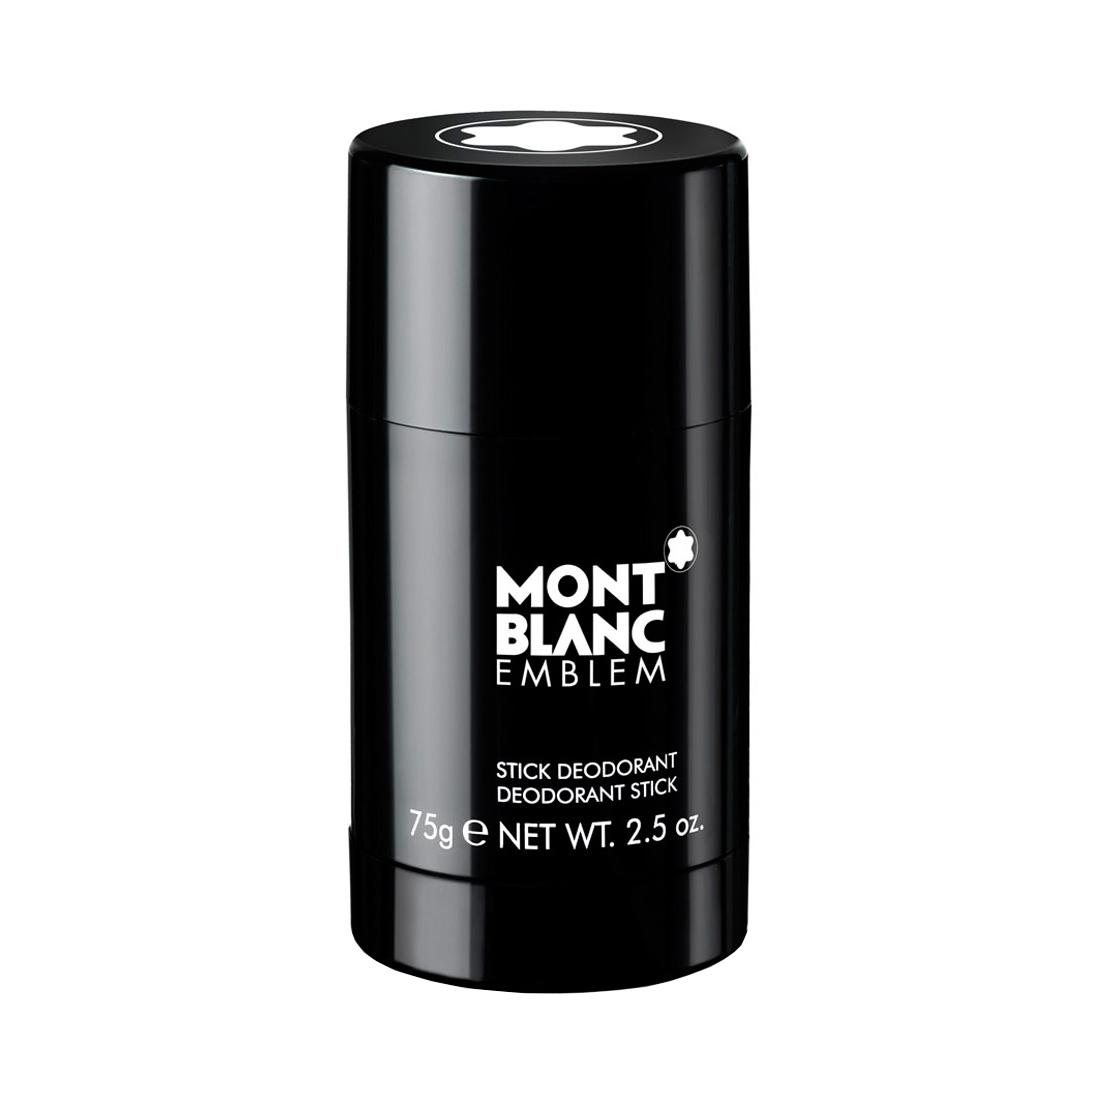 Déodorant stick Emblem - MONTBLANC